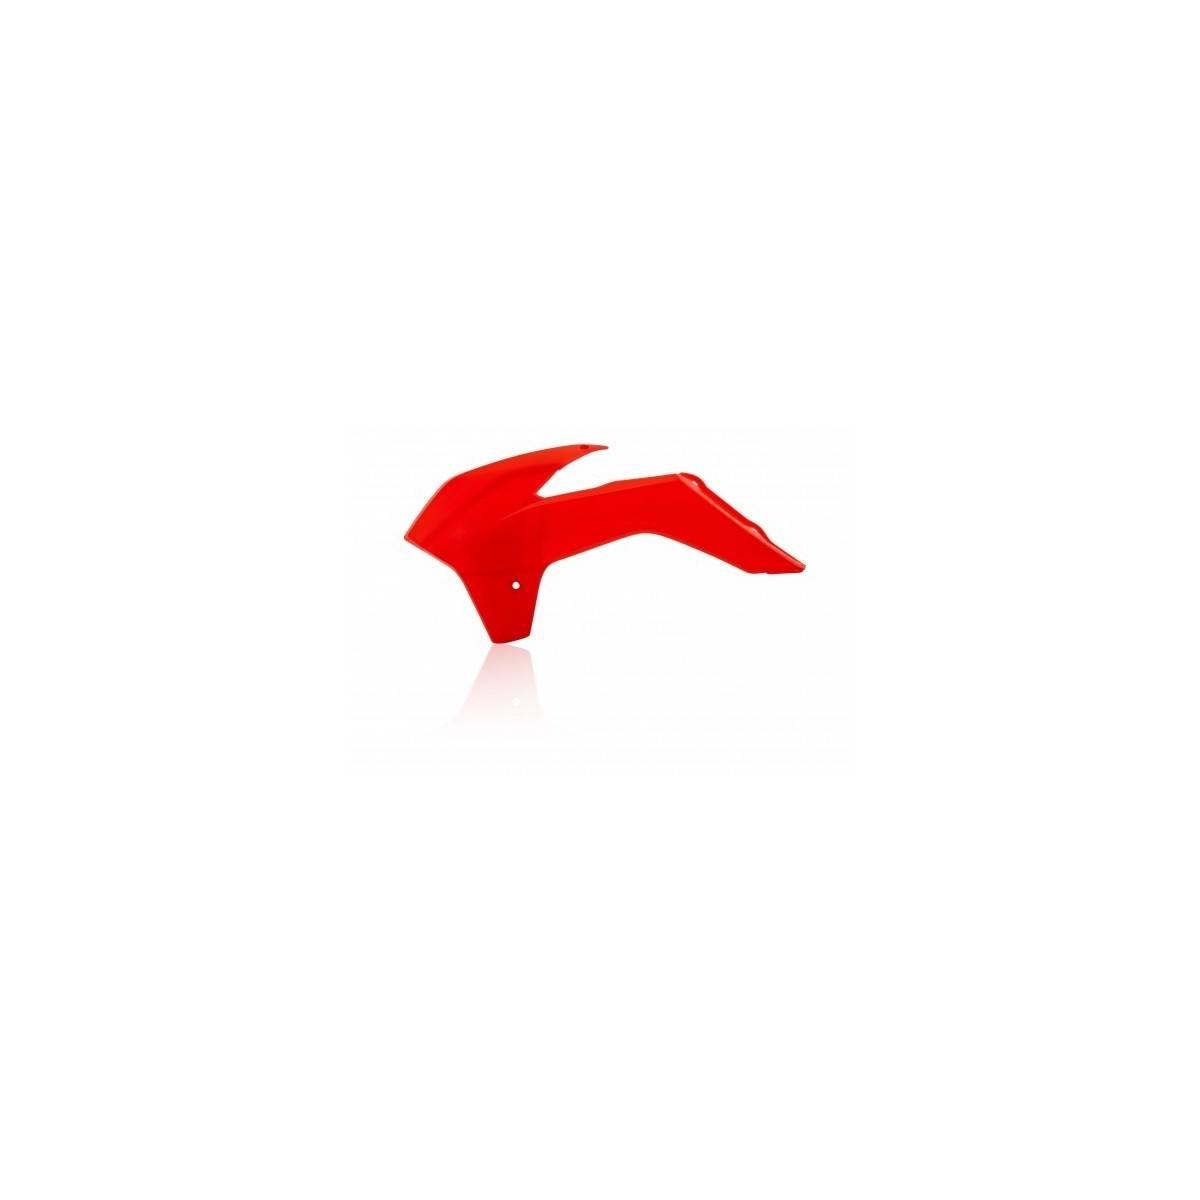 0016890-110 - Tapa Radiador Crf 250R 14 17 Crf450R 13 16´ Cre 450F 13 17 Rojo